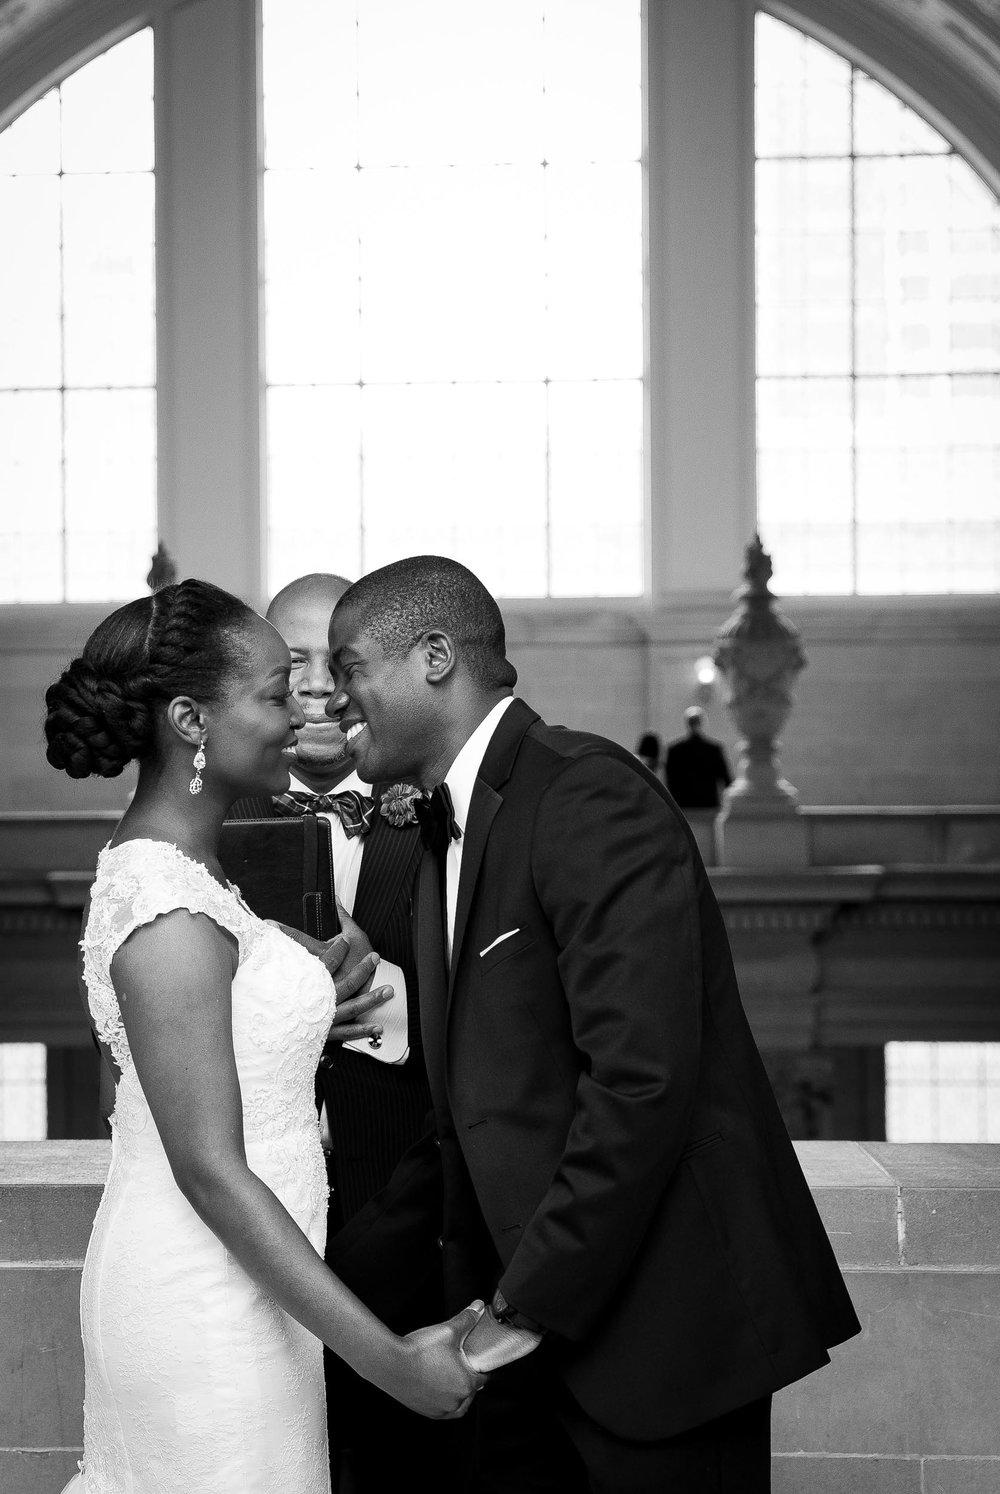 San Francisco city hall wedding ceremony-Atiyyah and Guy Marino-22.jpg